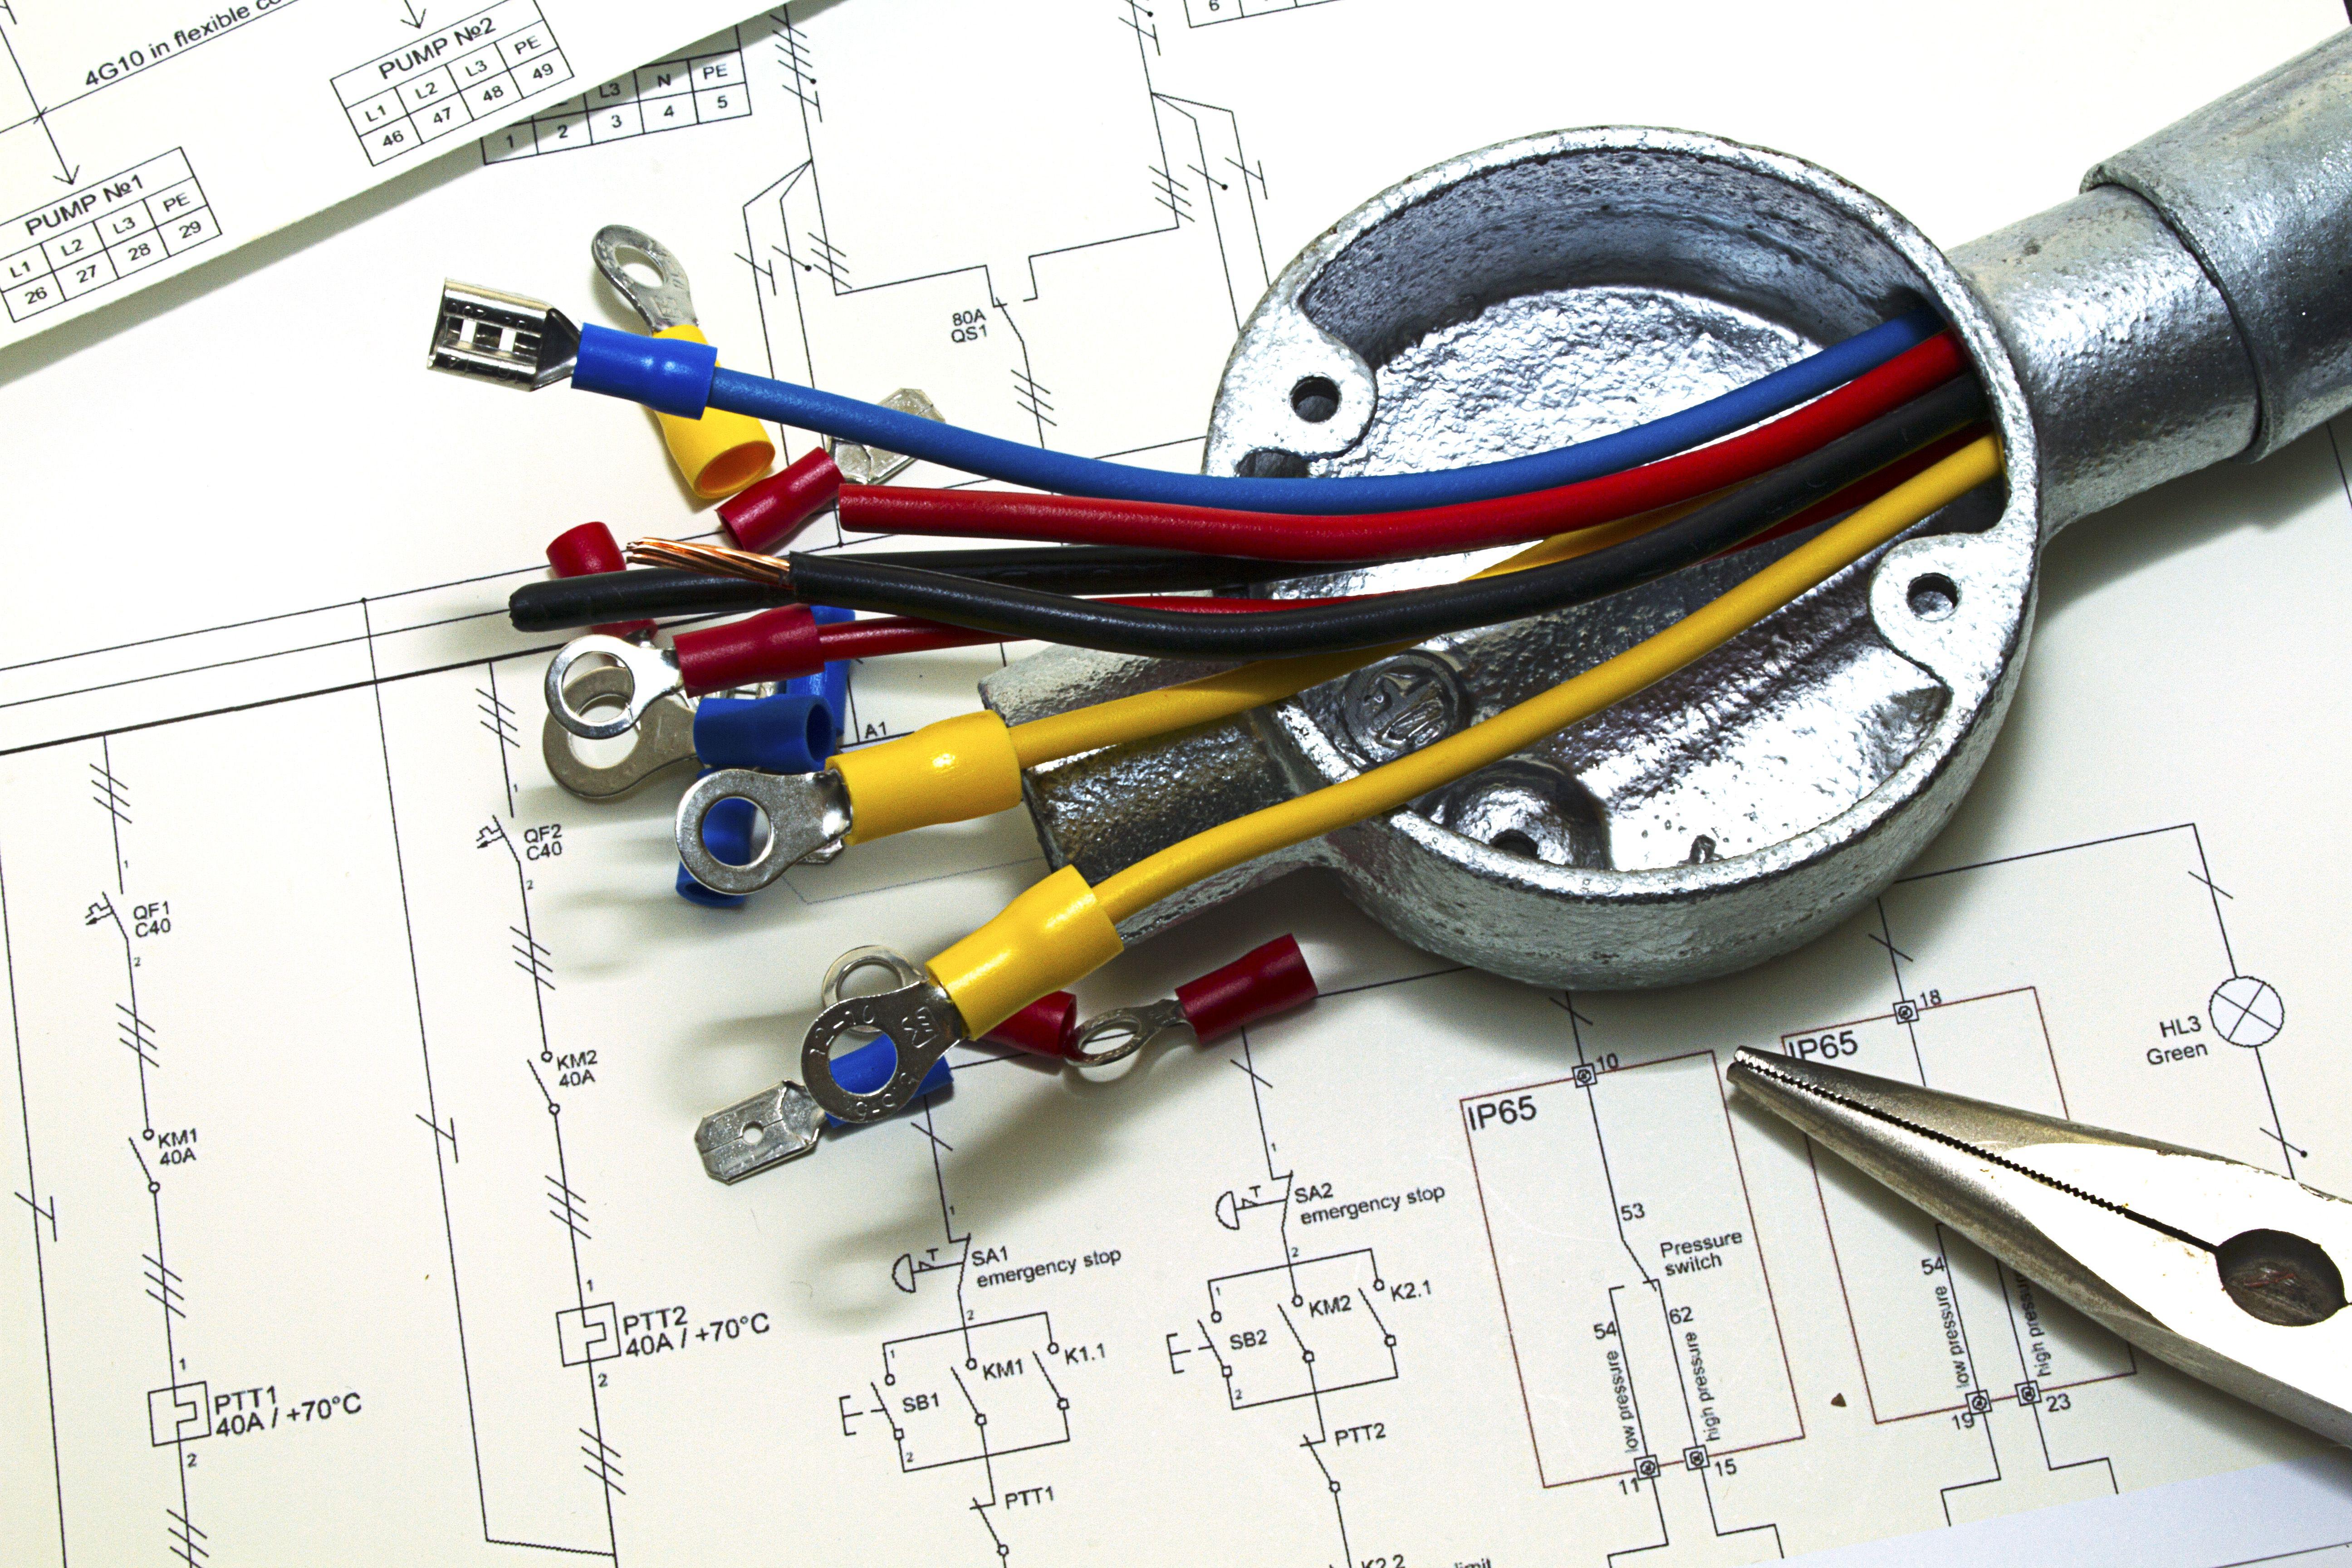 Reparación de averías eléctricas en Getafe